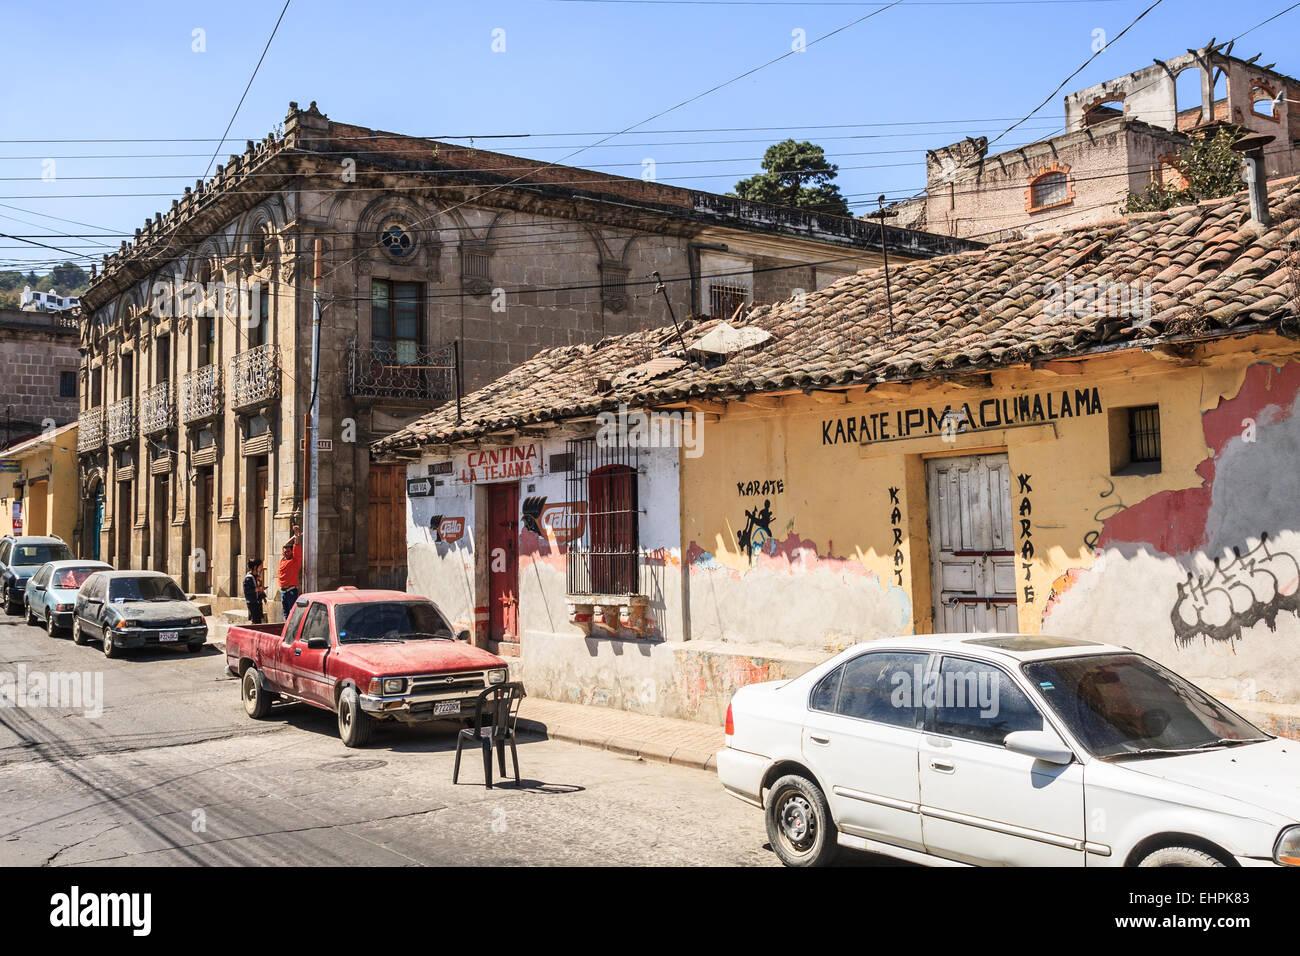 Ufficio Moderno Xela : City center guatemala city immagini & city center guatemala city